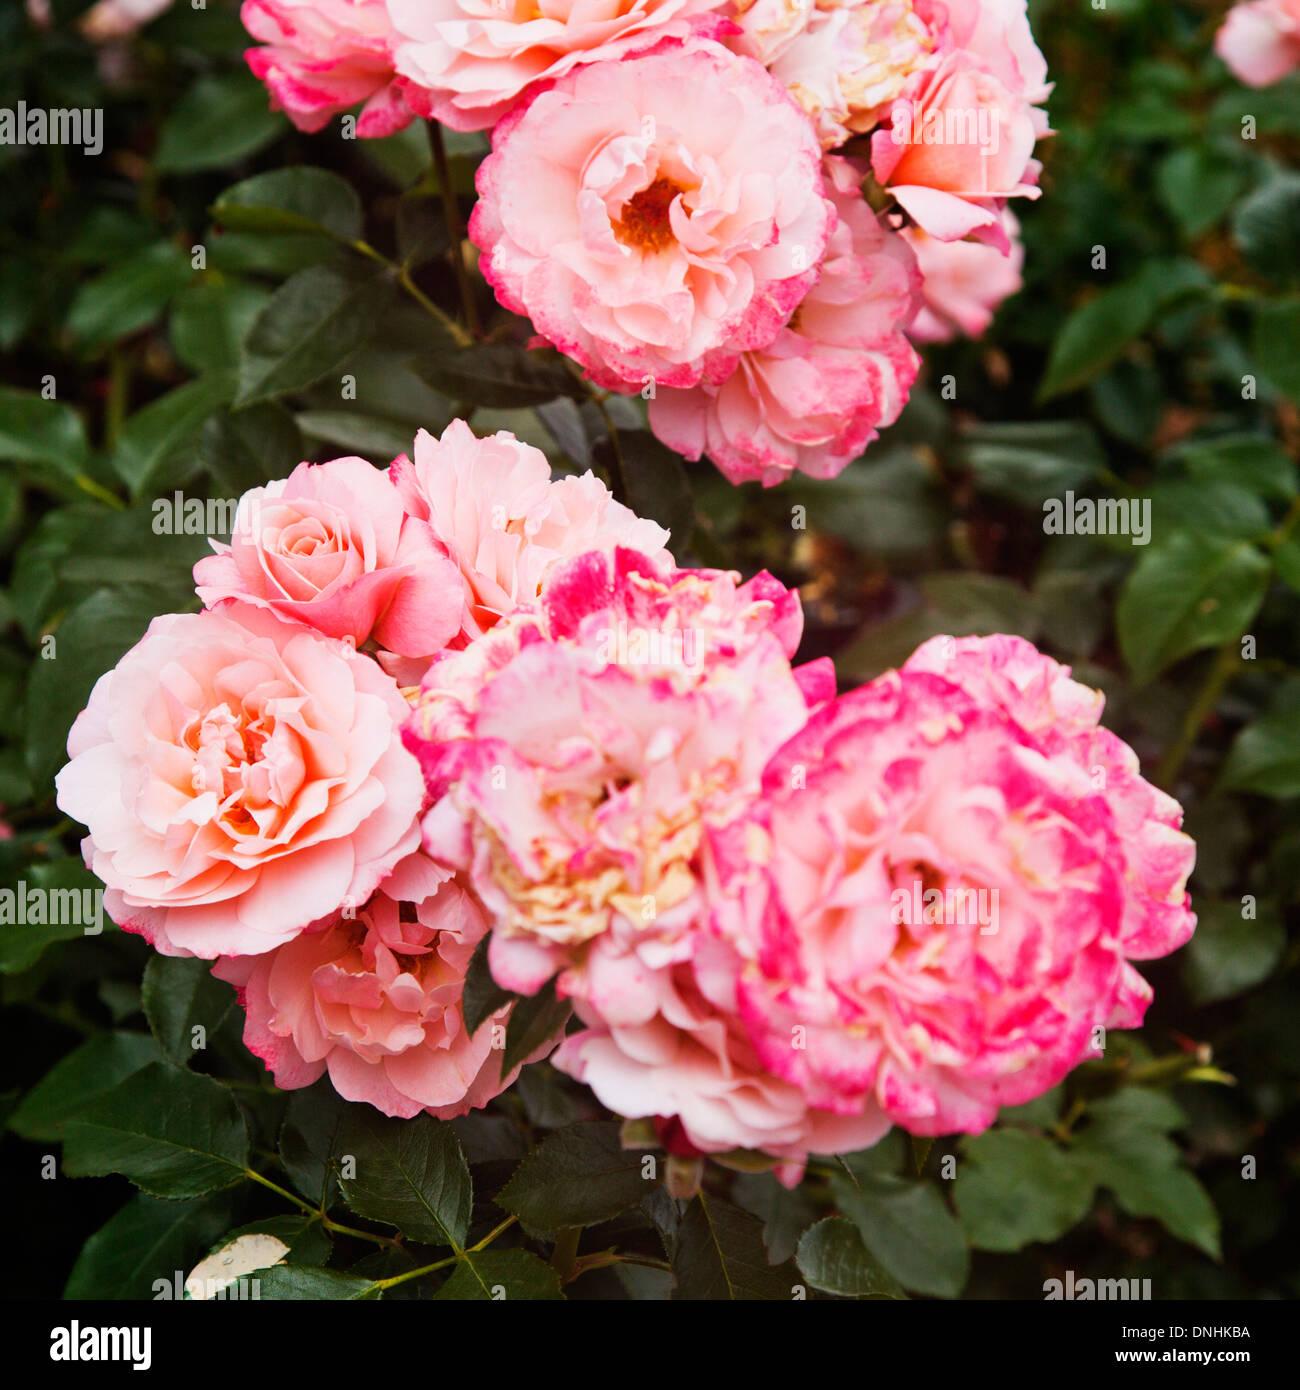 Nahaufnahme von Rose Blumen, Villa Cimbrone, Ravello, Provinz Salerno, Kampanien, Italien Stockfoto